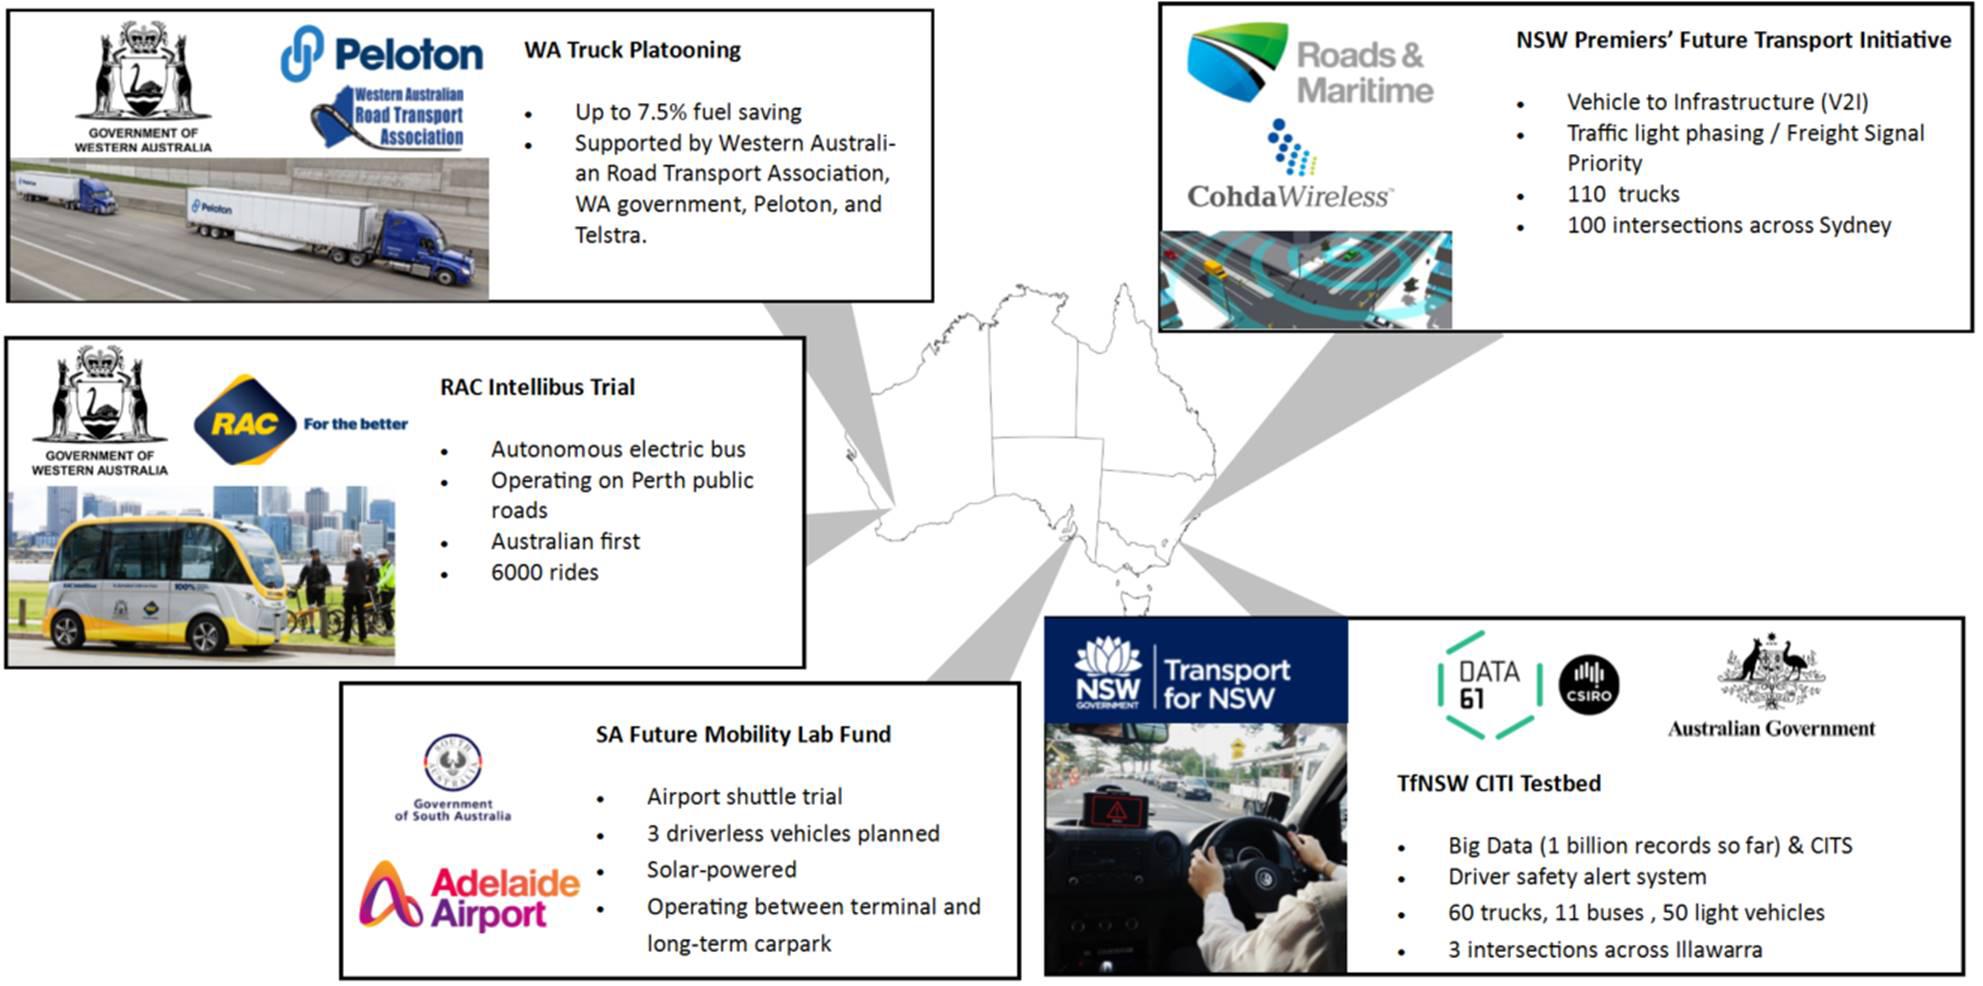 News Green Truck Partnership Air Quality Environment